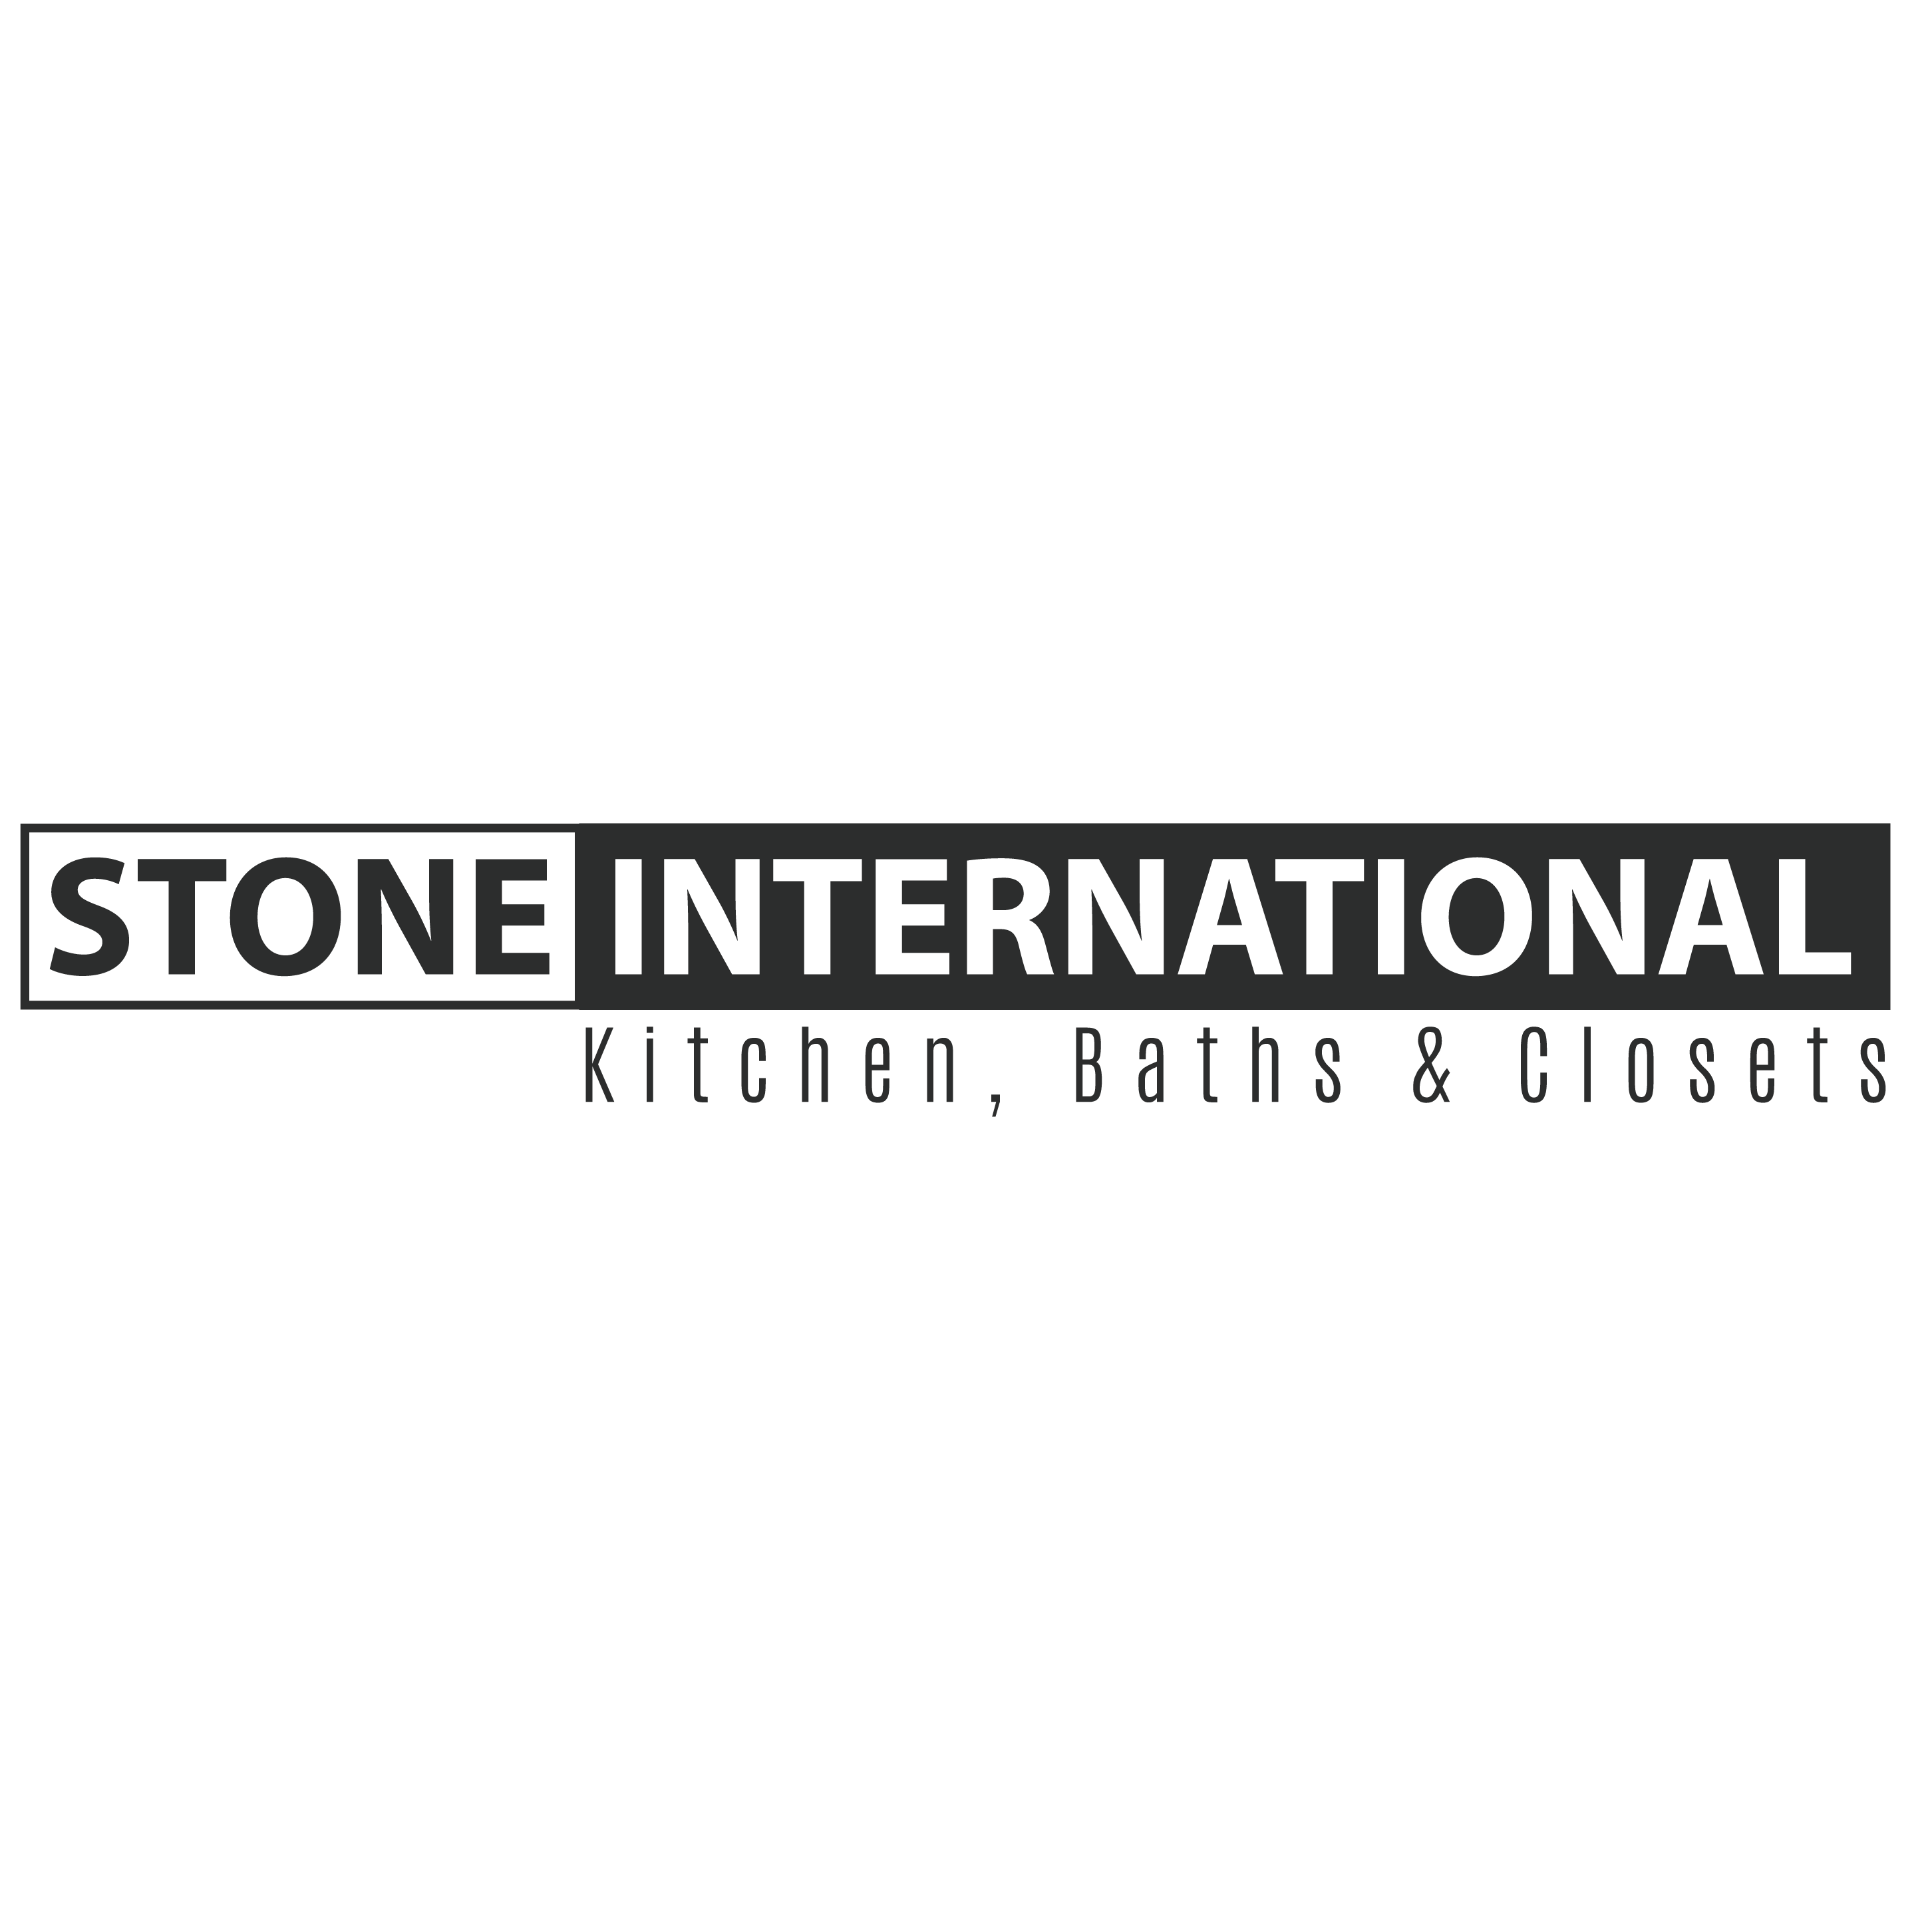 Stone International Kitchen, Baths, & Closets